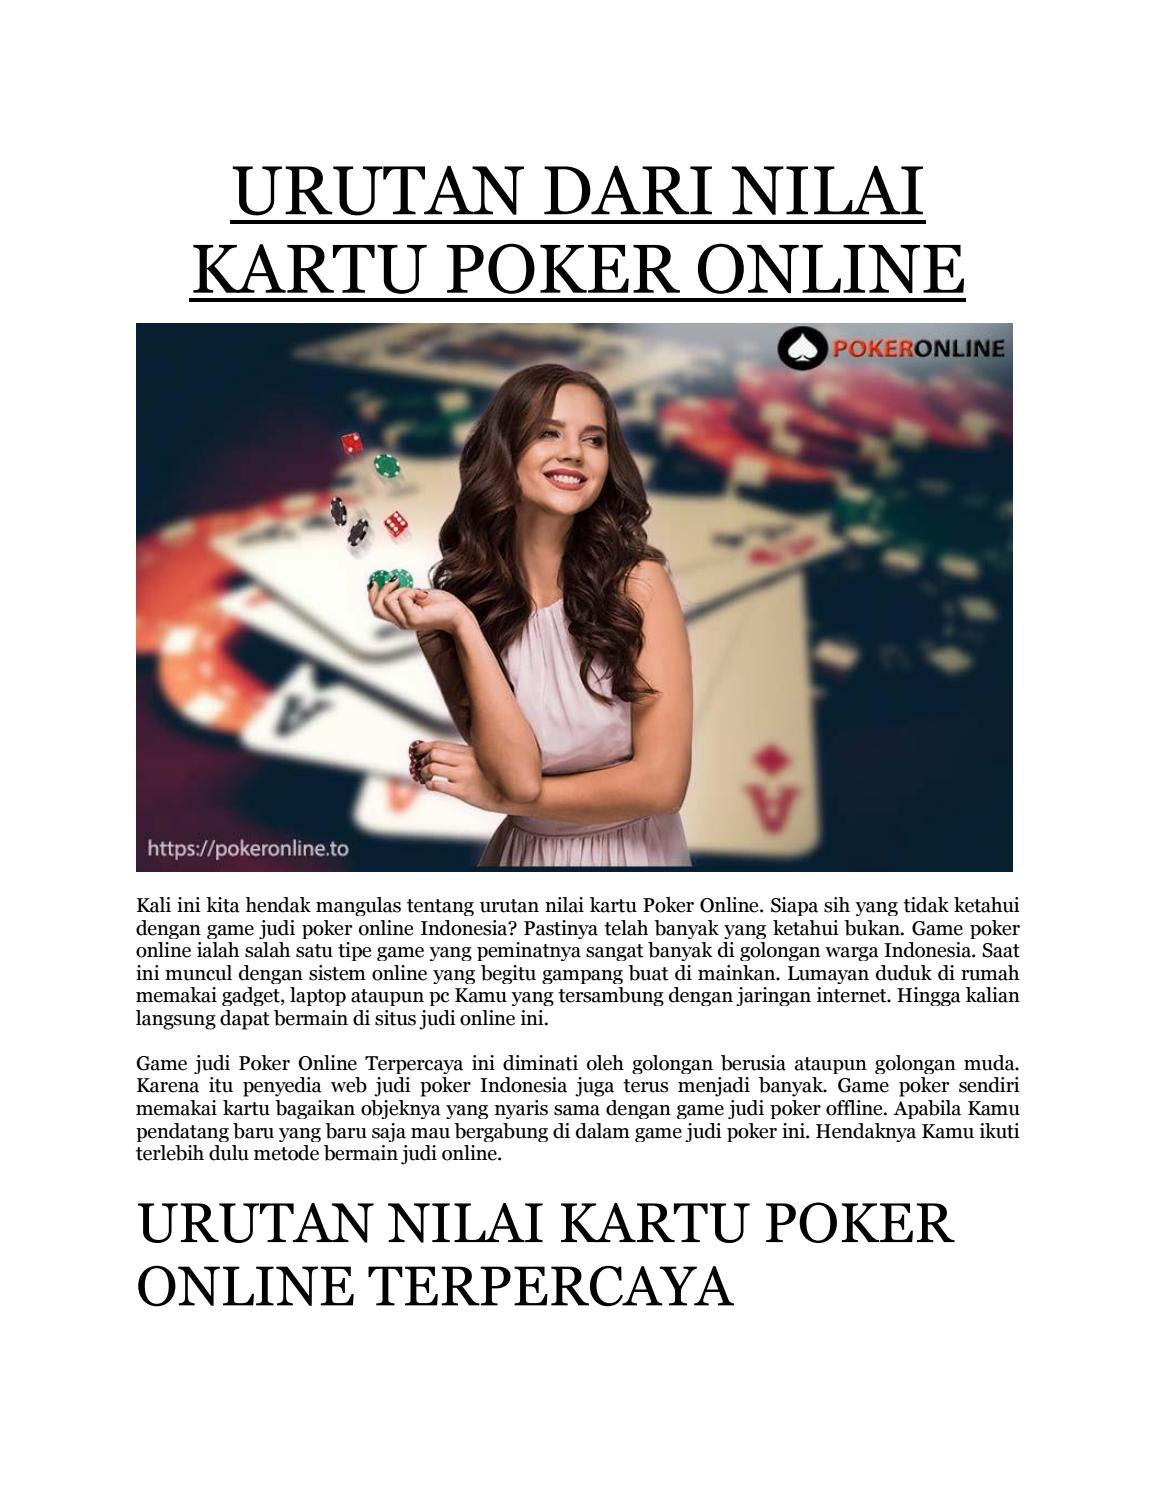 Urutan Dari Nilai Kartu Poker Online By Poker Online Issuu